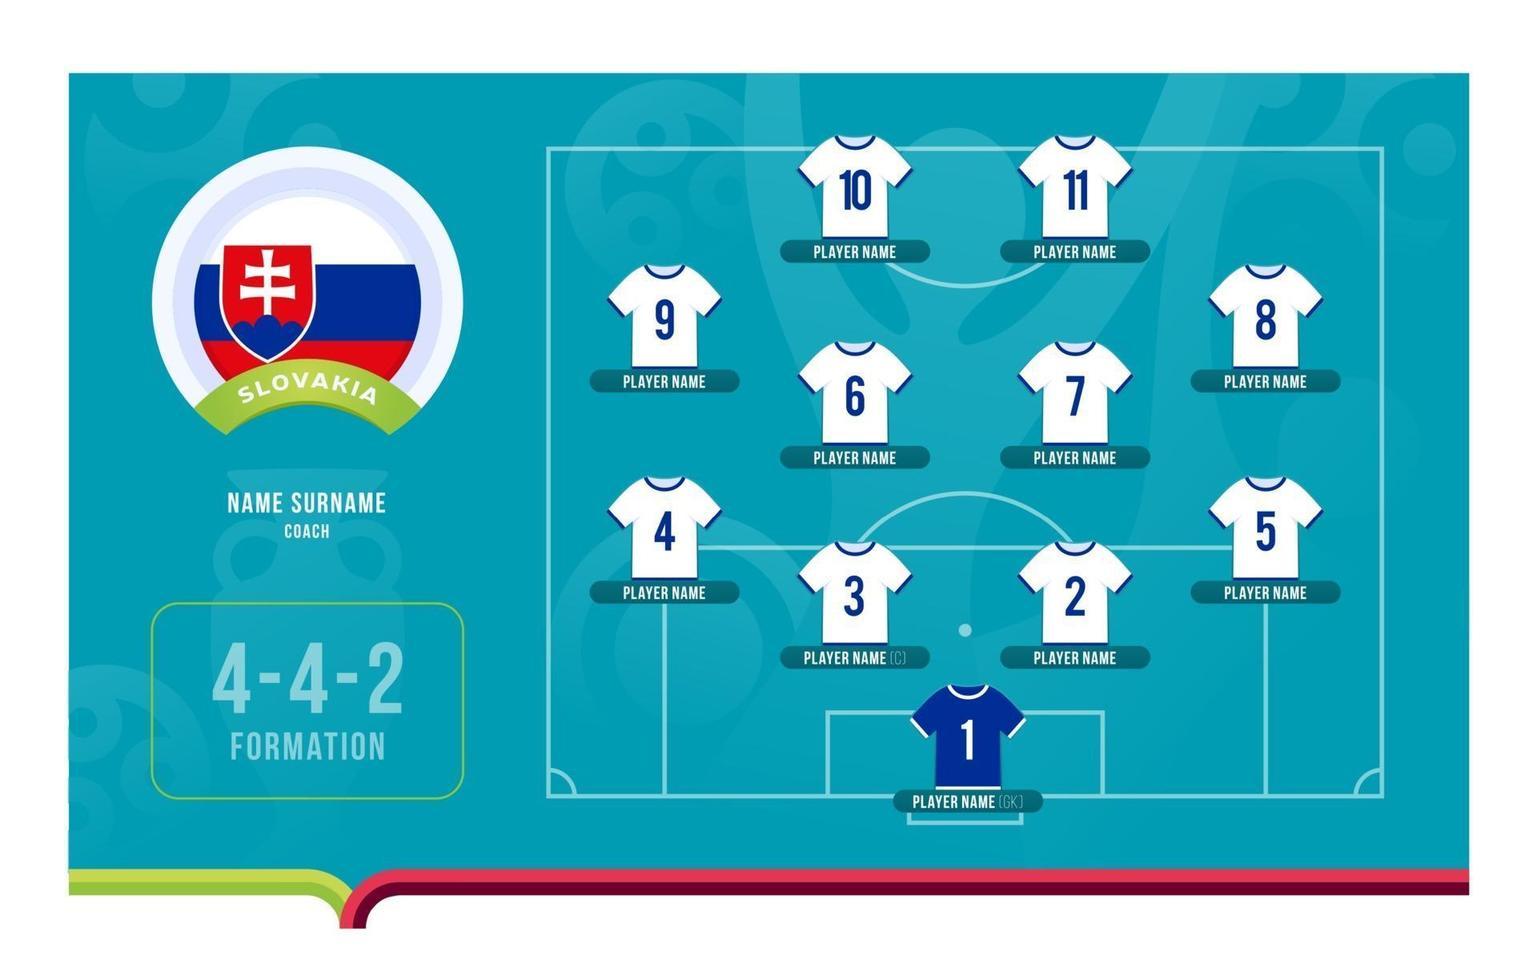 Slovakia line-up Football tournament final stage vector illustration